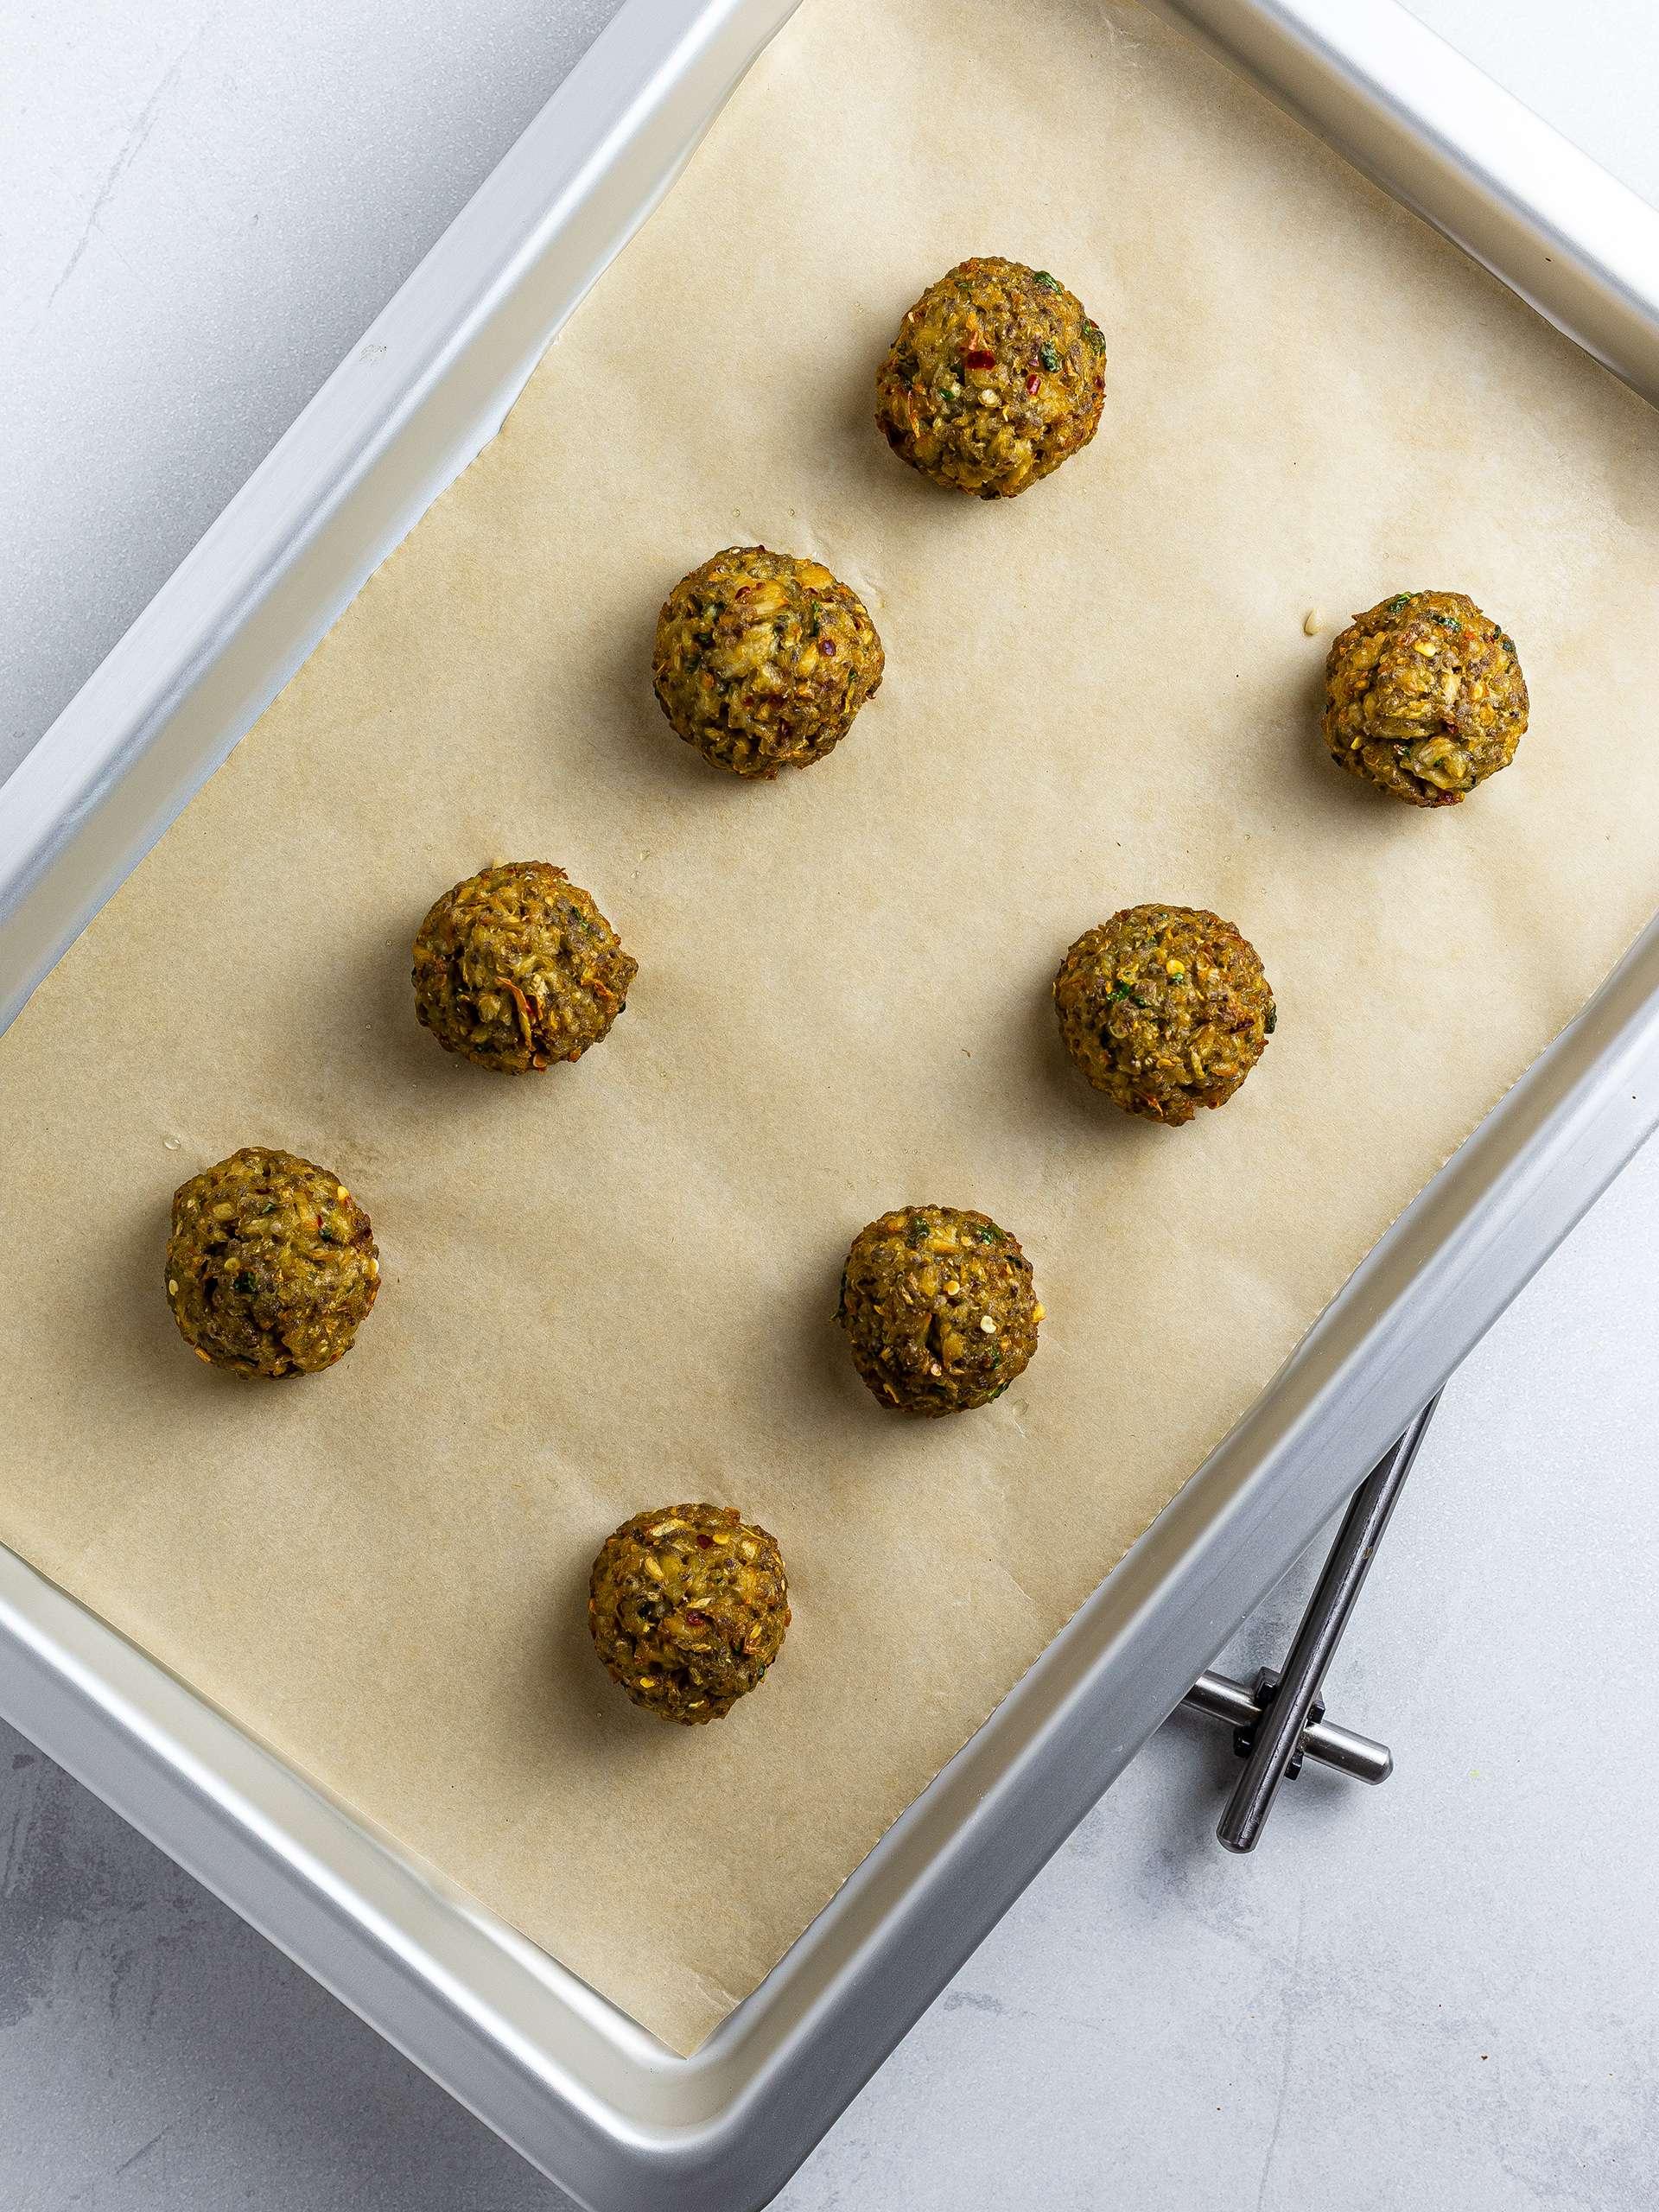 Oven-baked mushroom meatballs